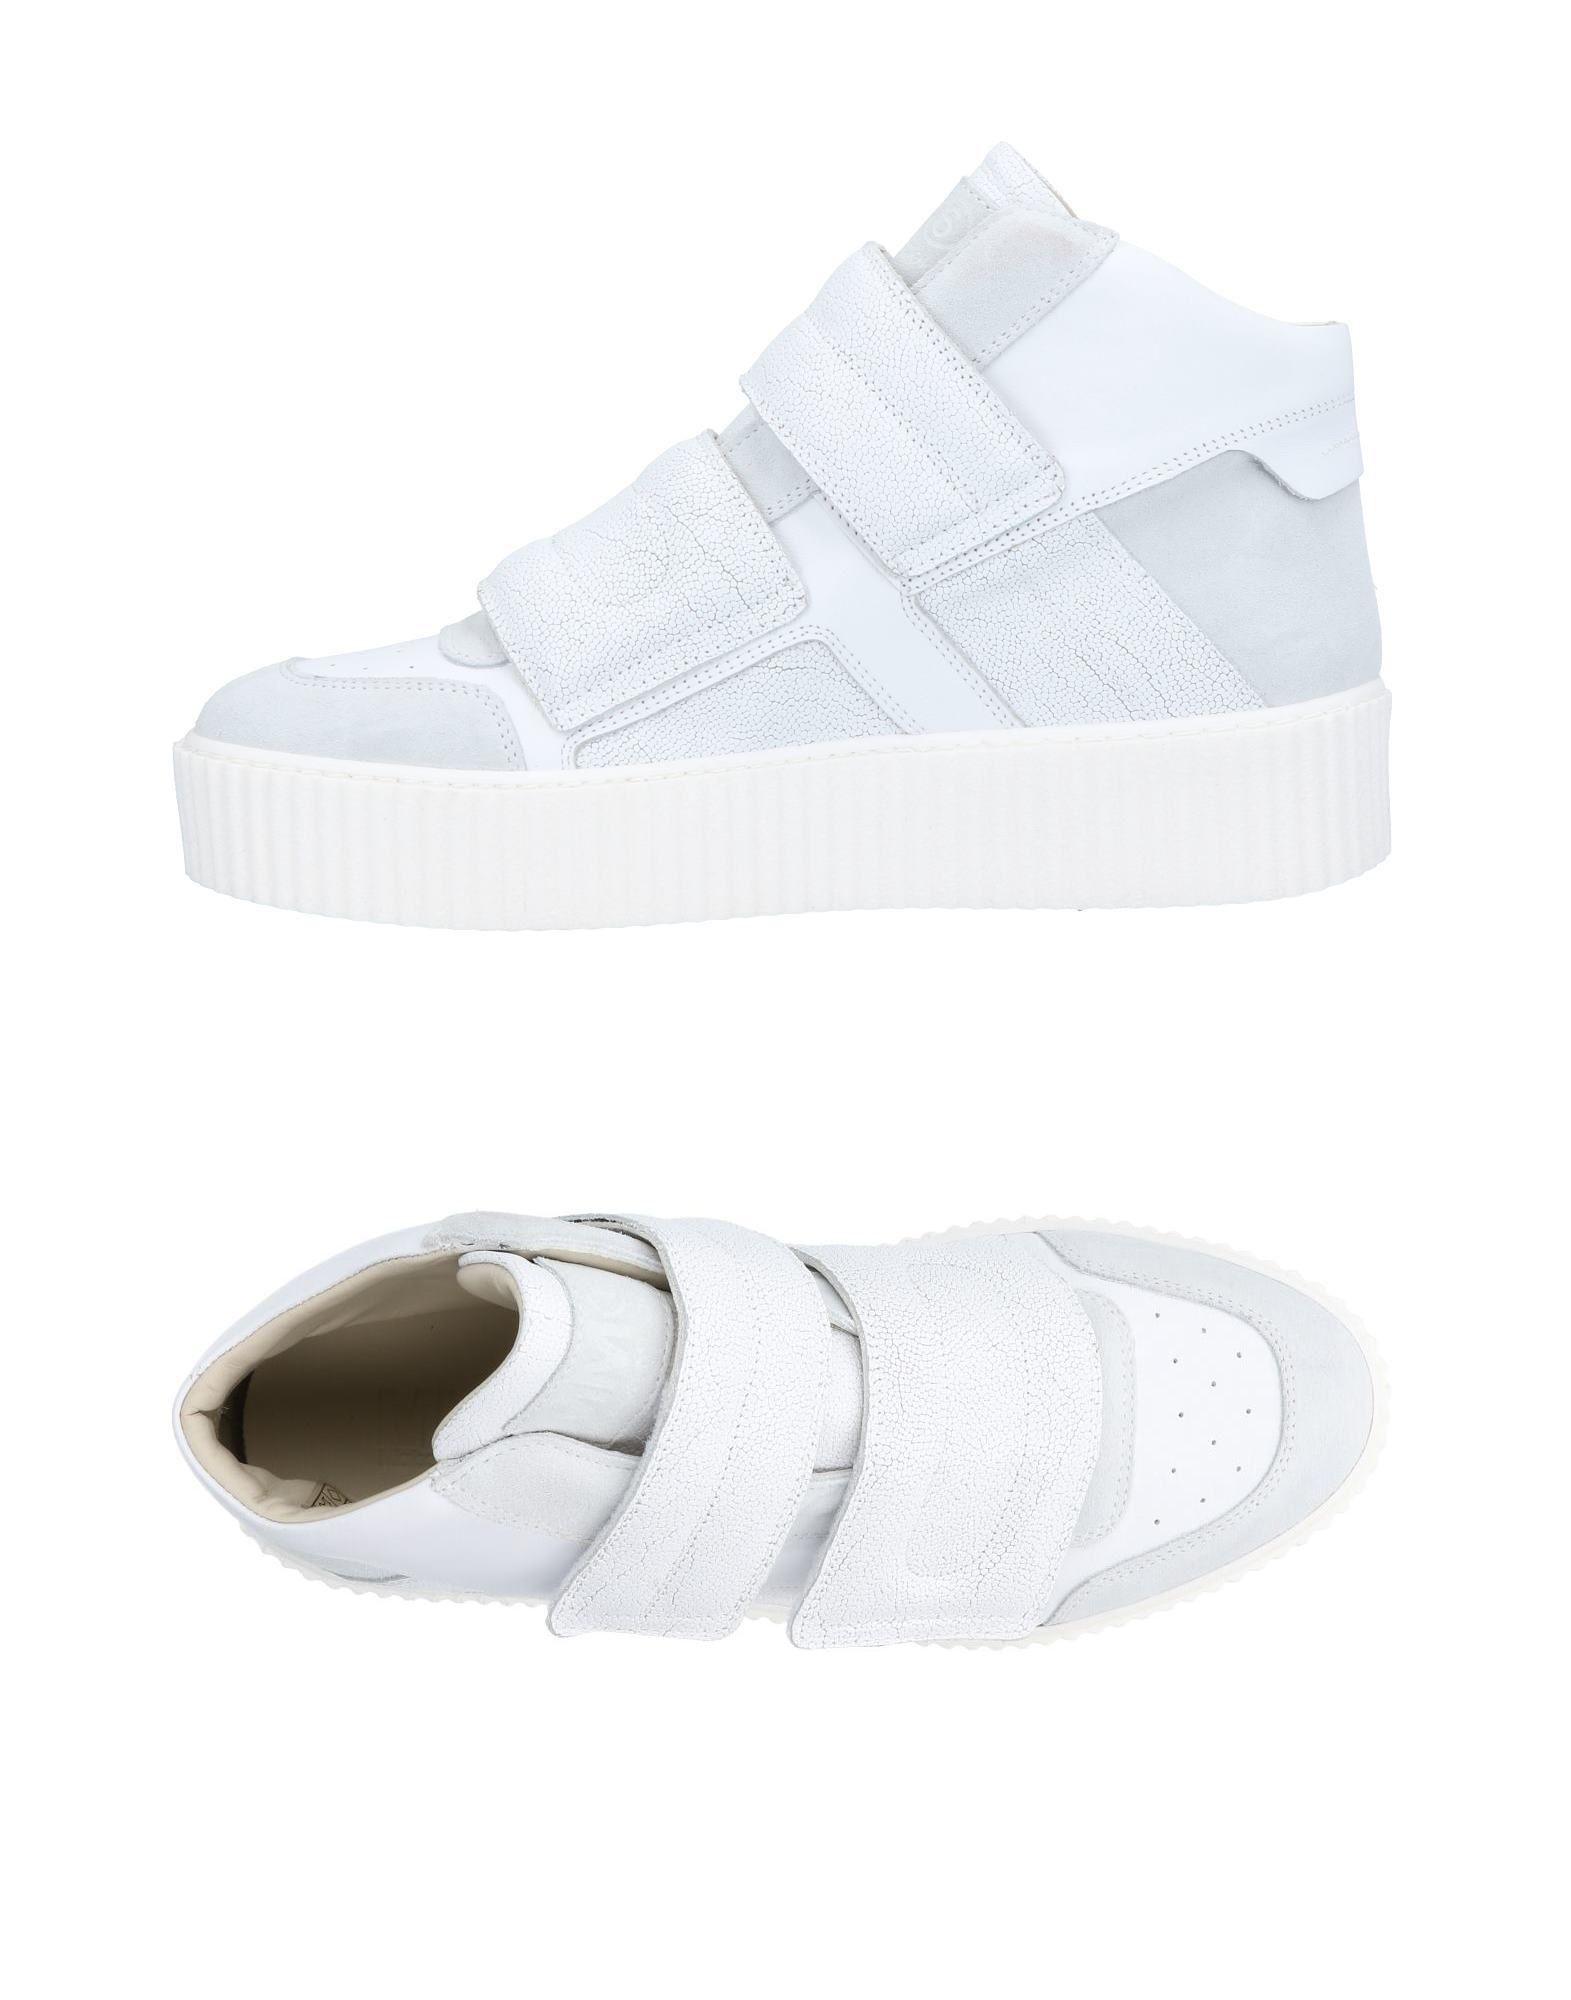 Mm6 Maison Margiela Sneakers Damen  11469547OQGut aussehende strapazierfähige Schuhe